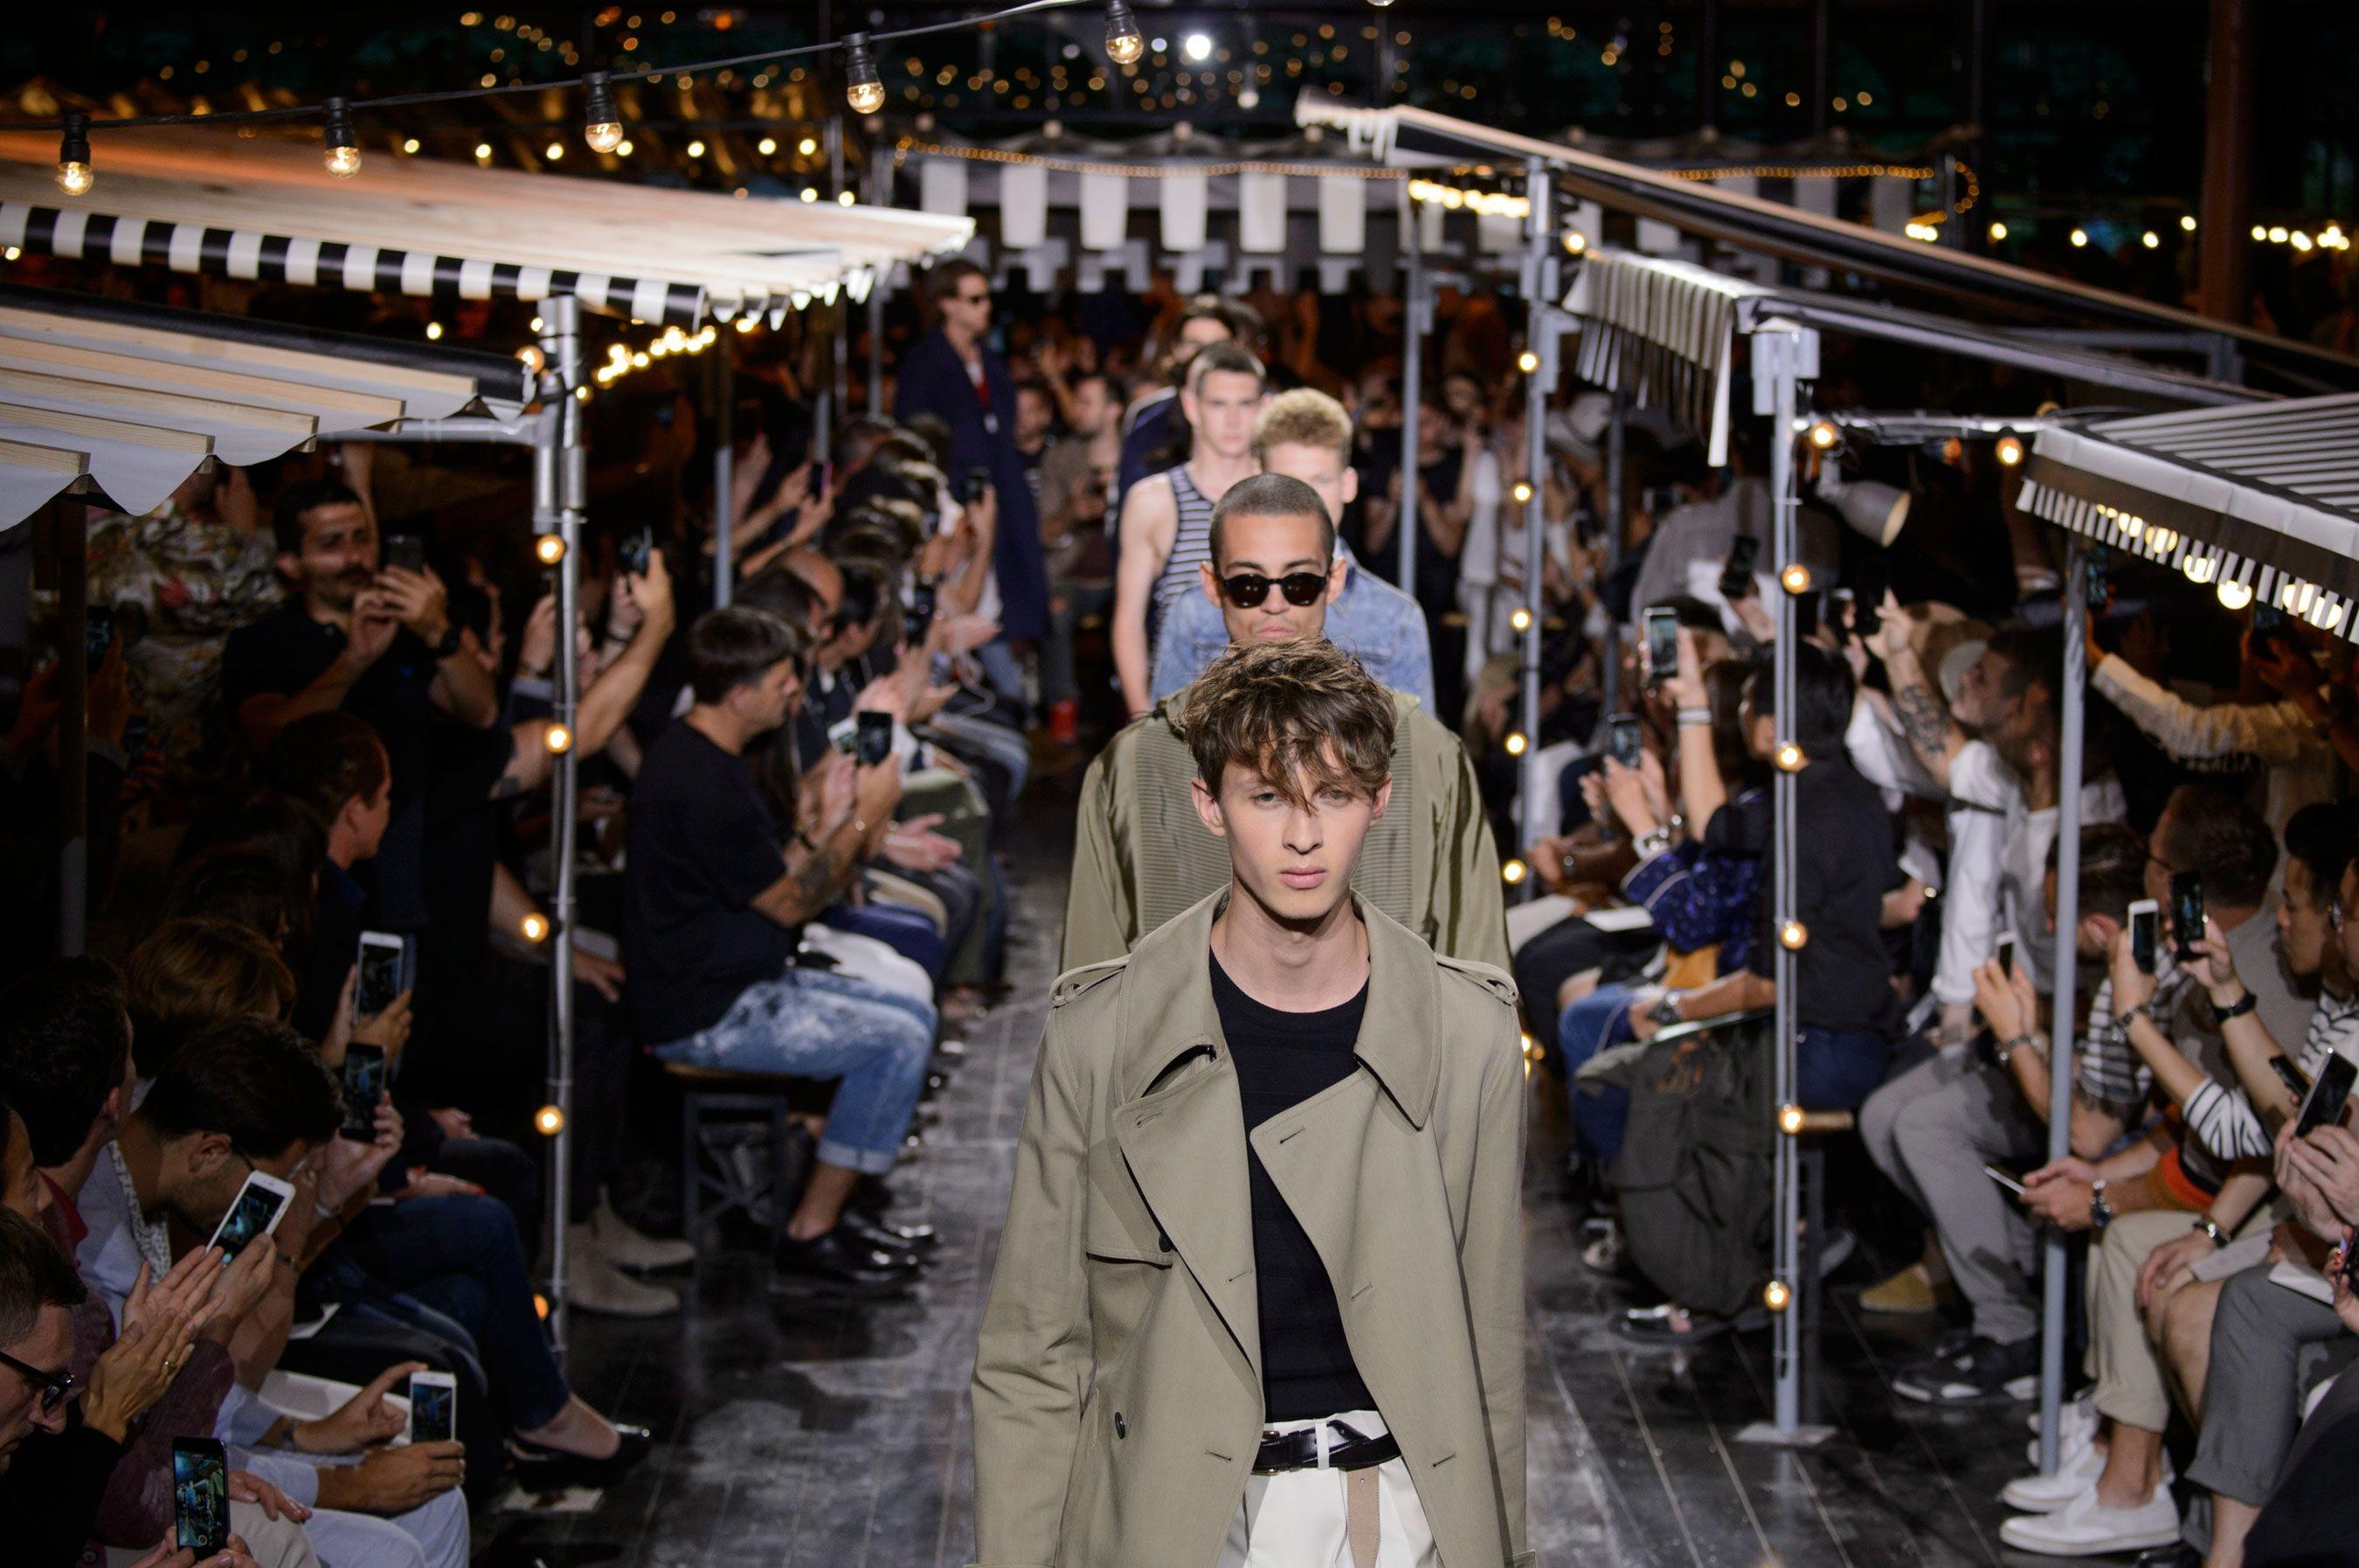 AMI Alexandre Mattiussi SpringSummer 2016 Collection - Paris Fashion Week - DerriusPierreCom (38)